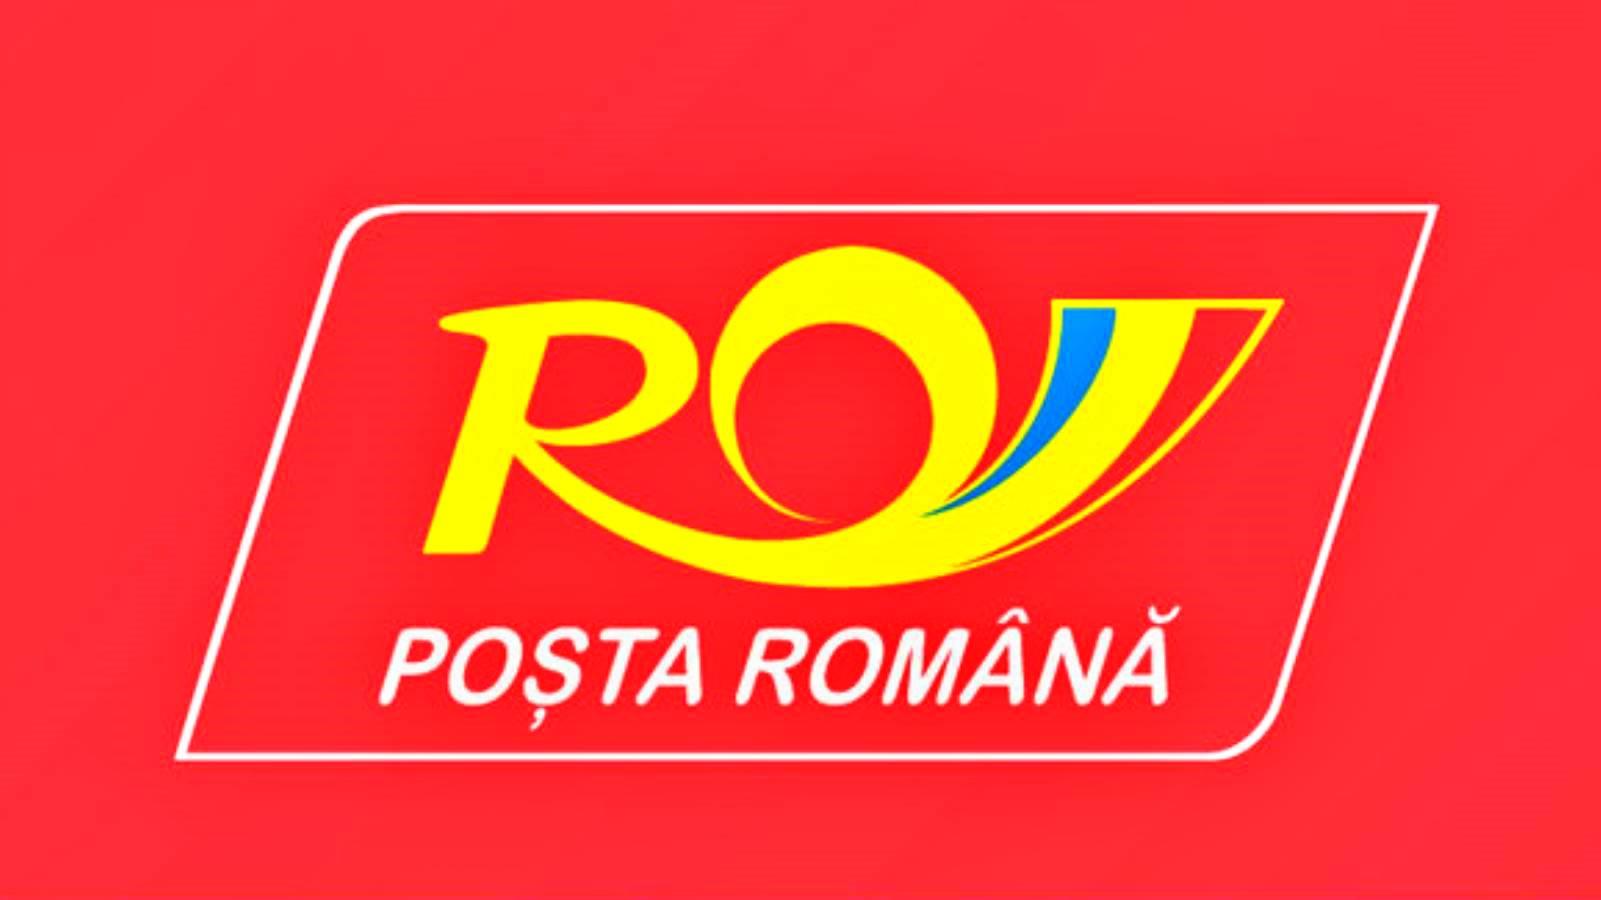 Posta Romana carti postale personalizatePosta Romana carti postale personalizate